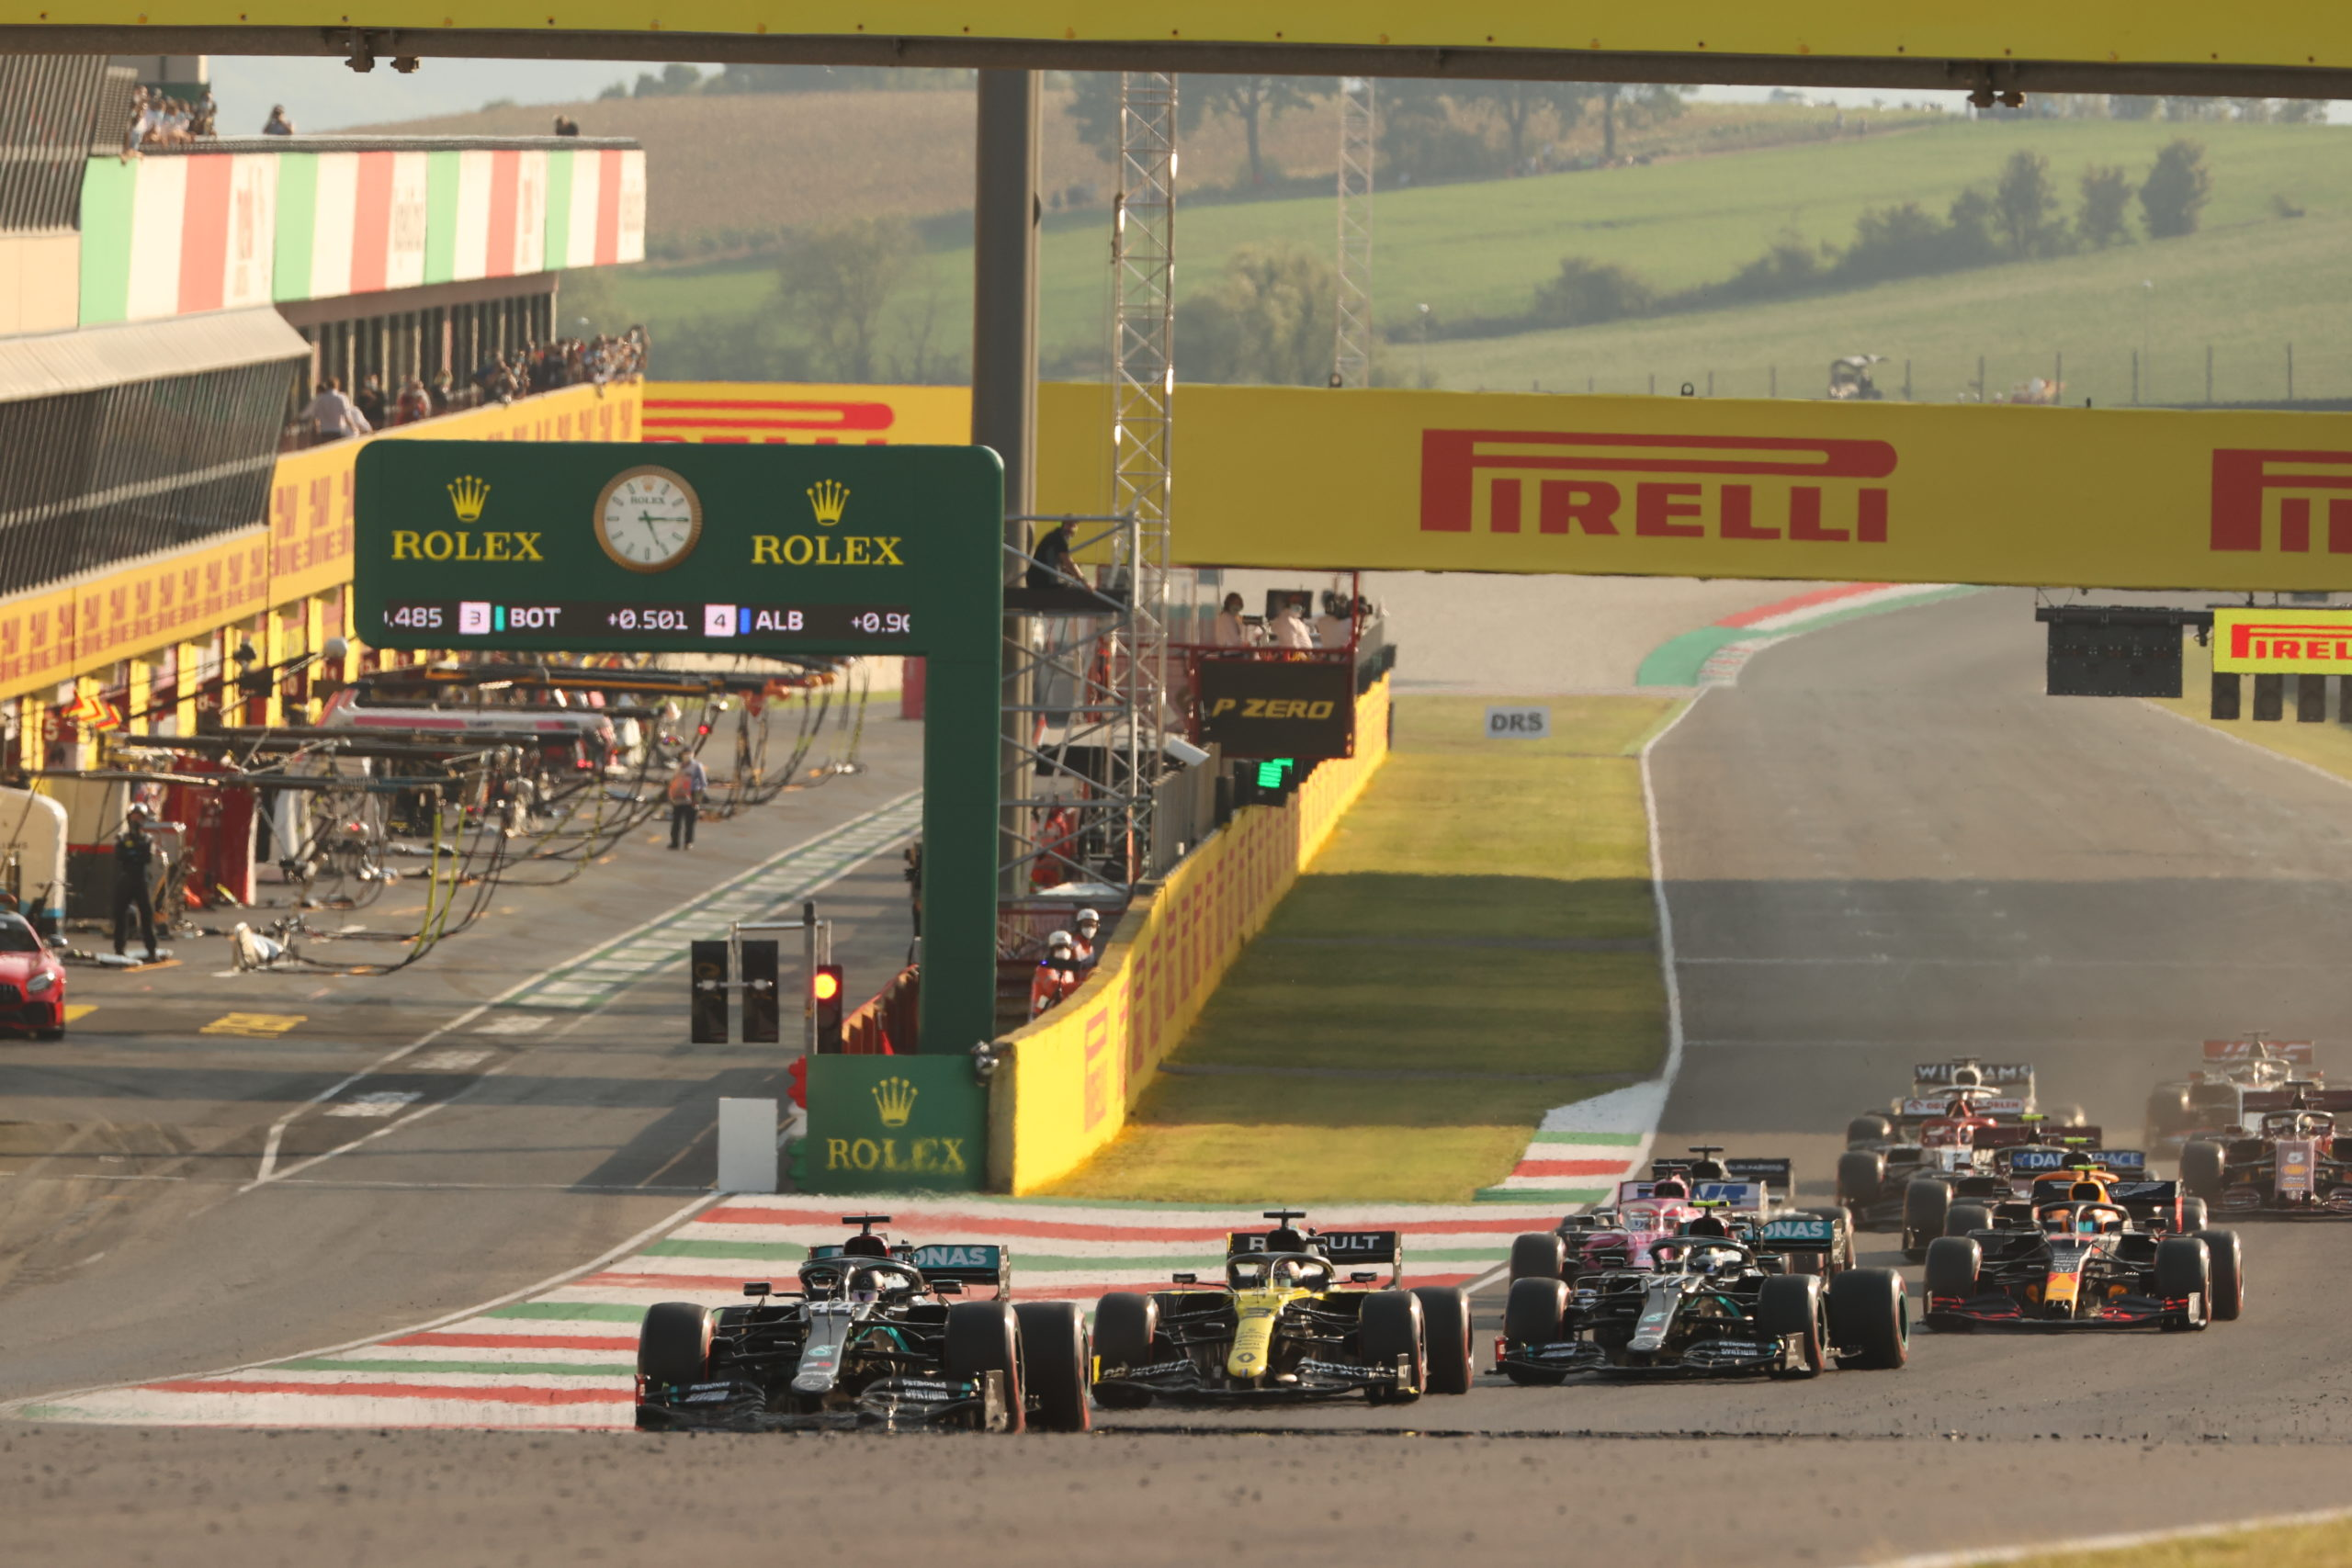 2020 Tuscan Grand Prix, Sunday - Wolfgang Wilhelm, Mercedes, Hamilton, Bottas